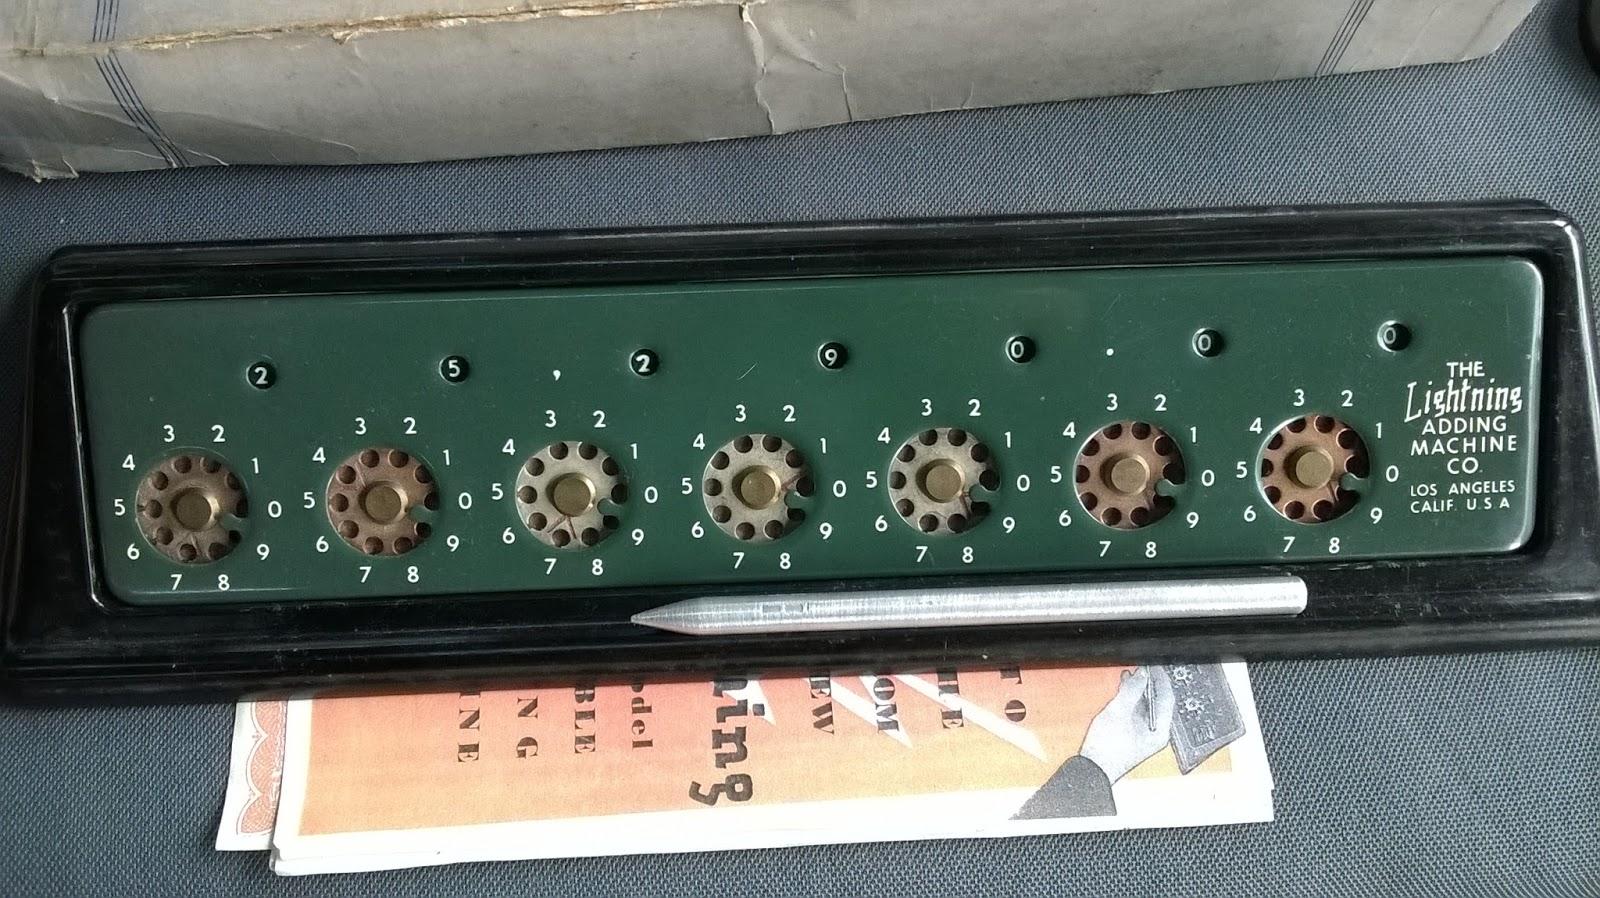 Original Lightning Adding Machine Control Panel